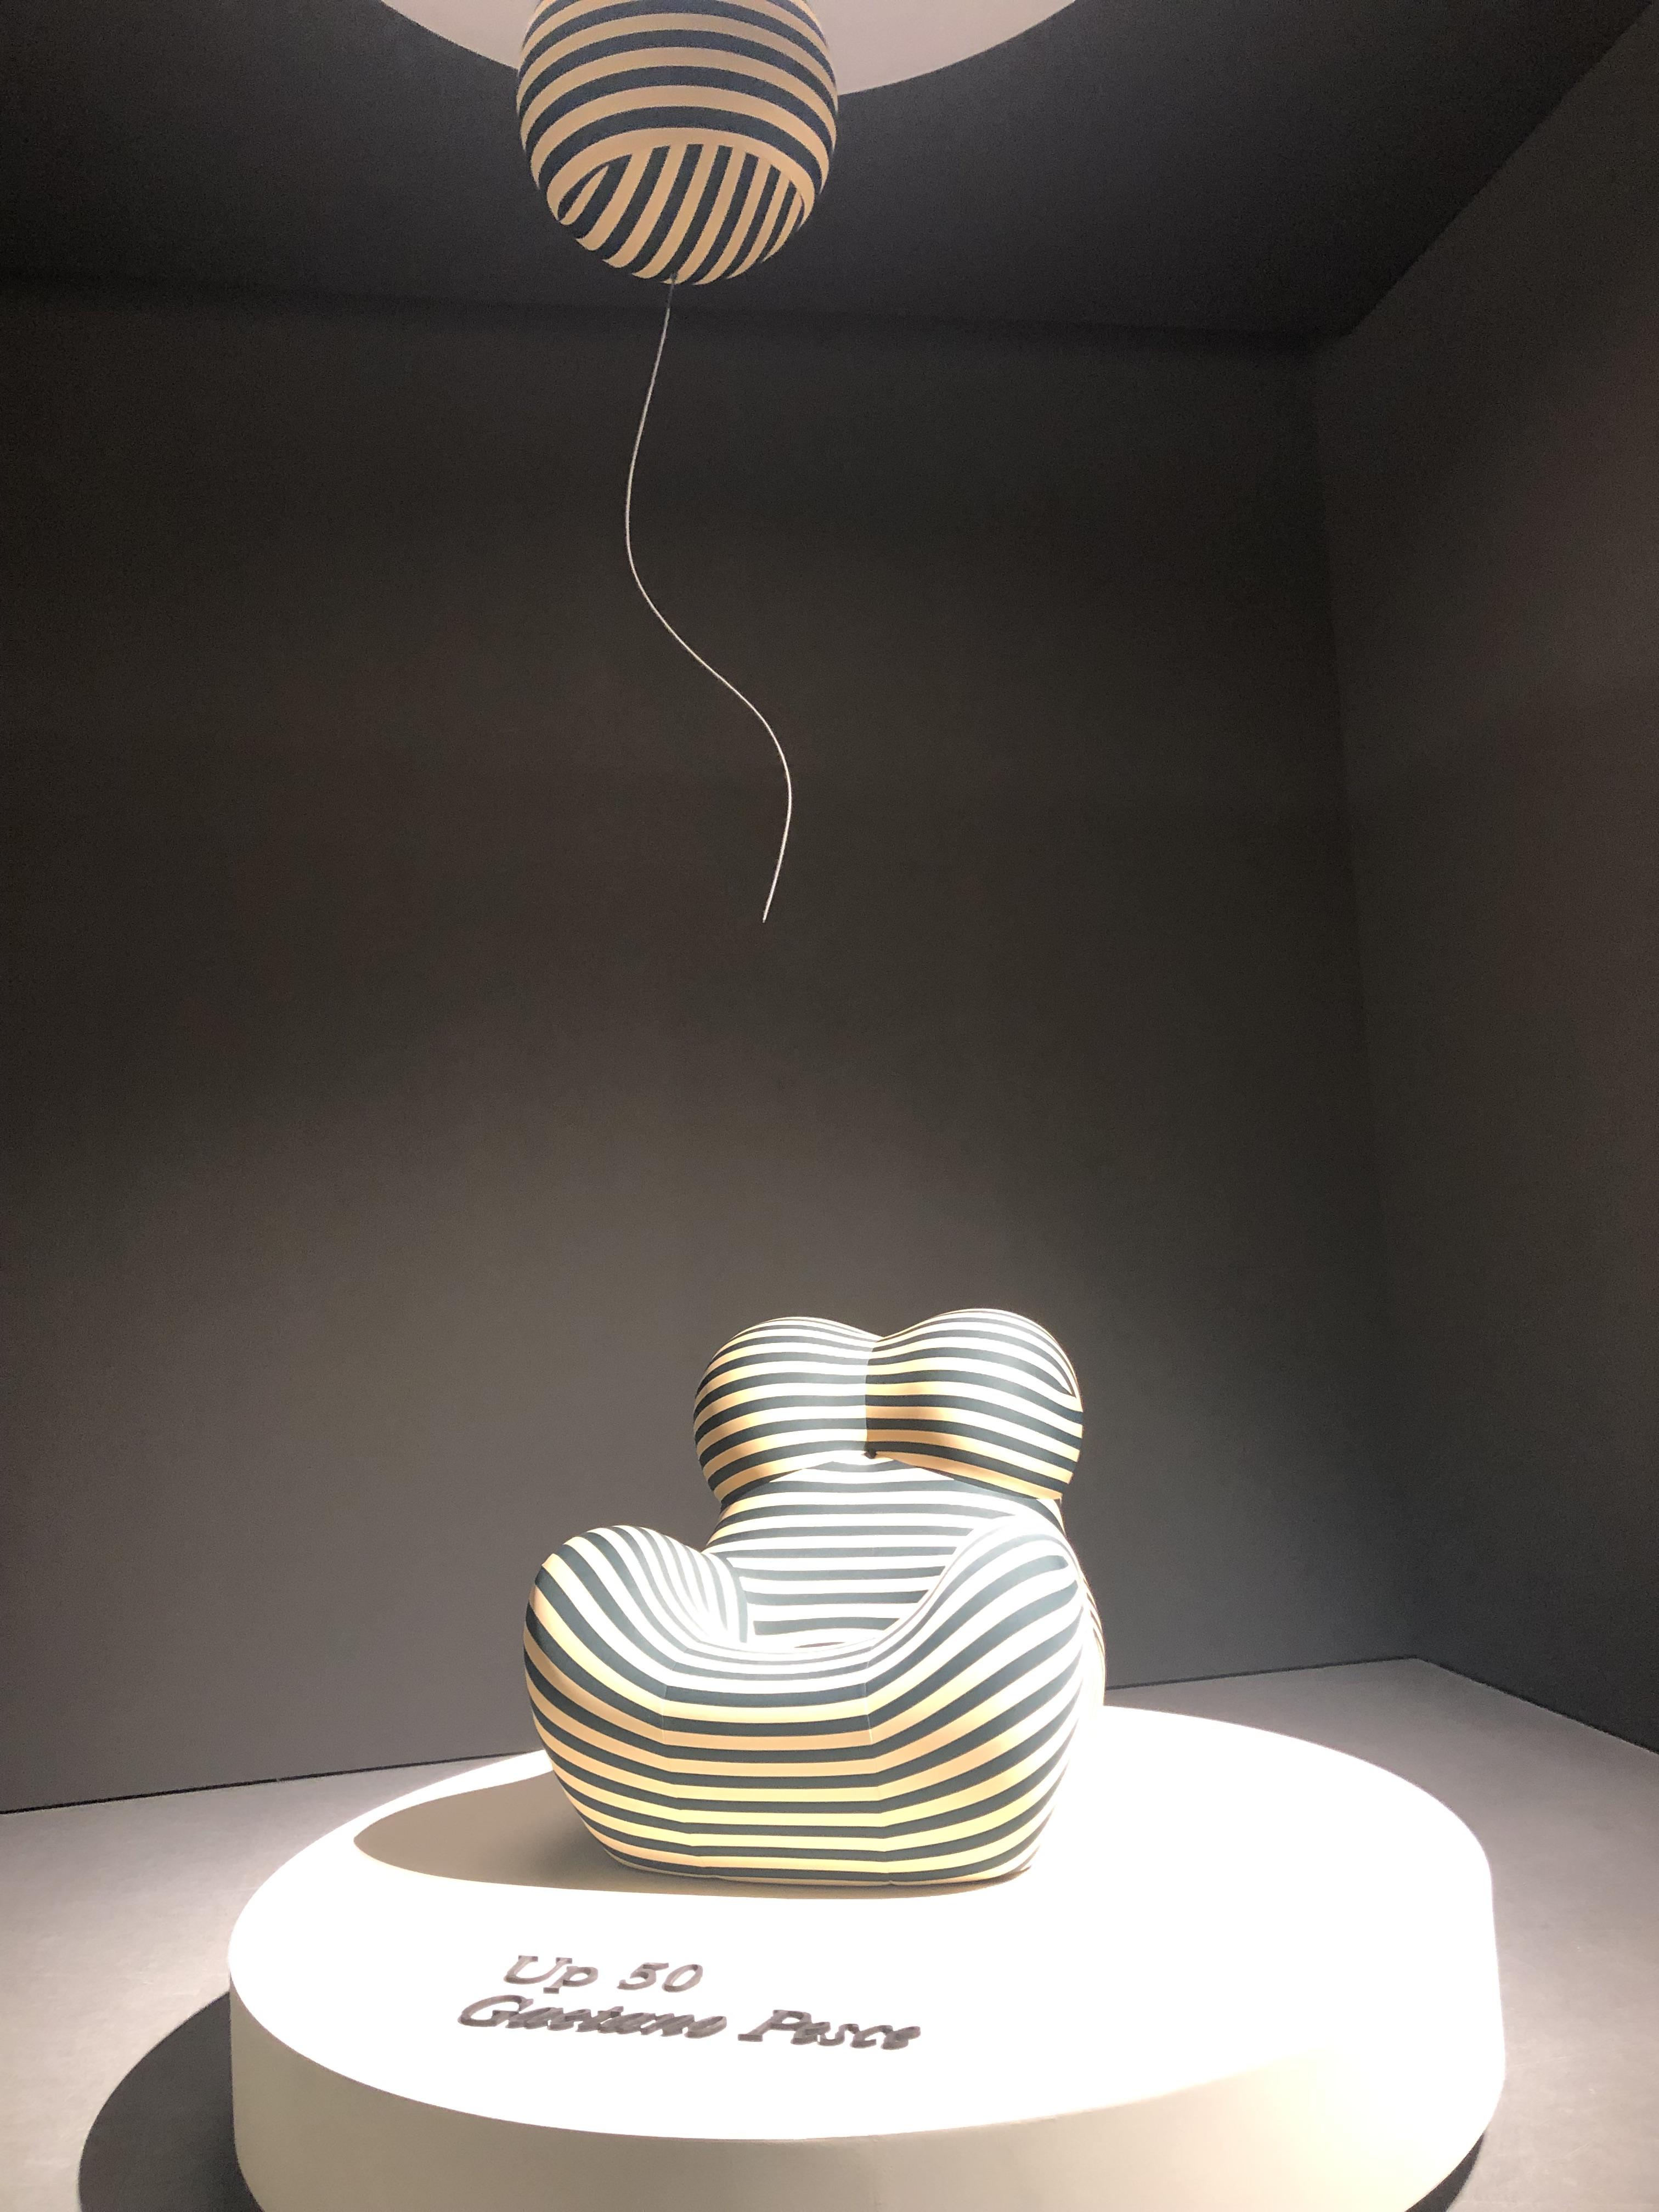 B&B Italia black and white striped chair and balloon at Salon Del Mobile 2019